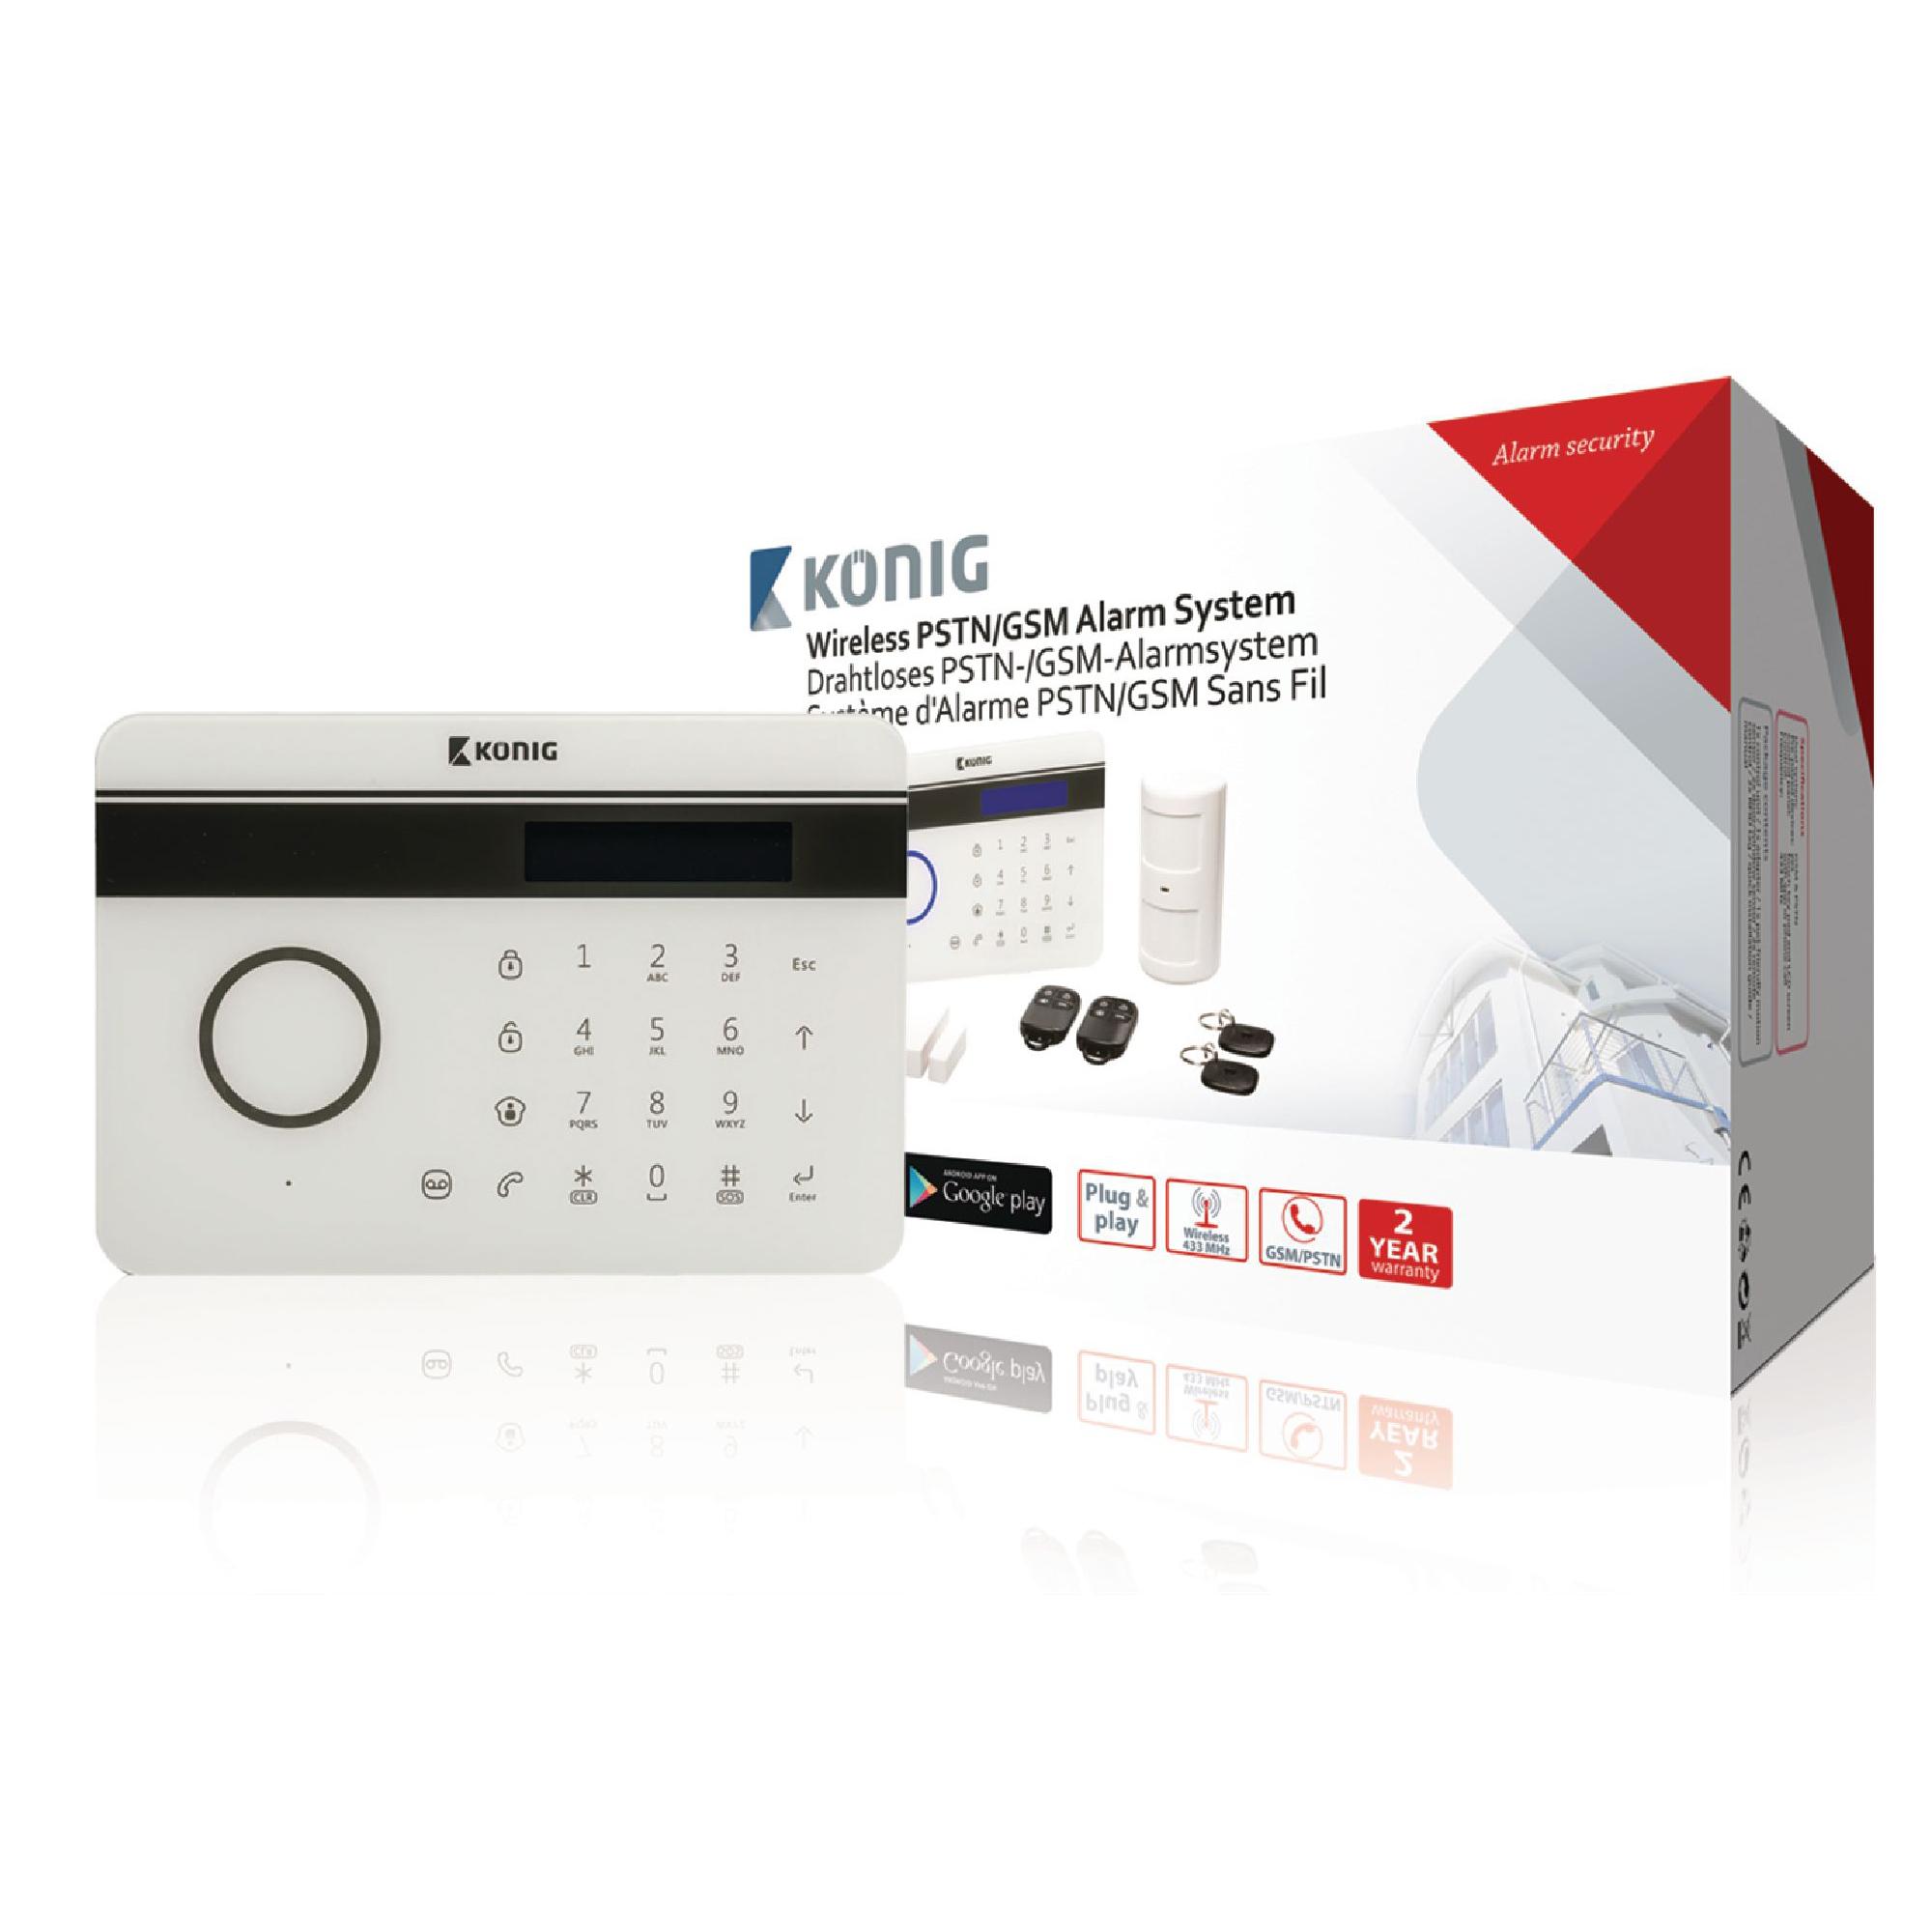 [notebooksbilliger] König SAS-ALARM300 drahtloses Festnetz-/GSM-Alarmsystem (inkl. 7x Komponenten, über Festnetz und Mobilfunk verwendbar)